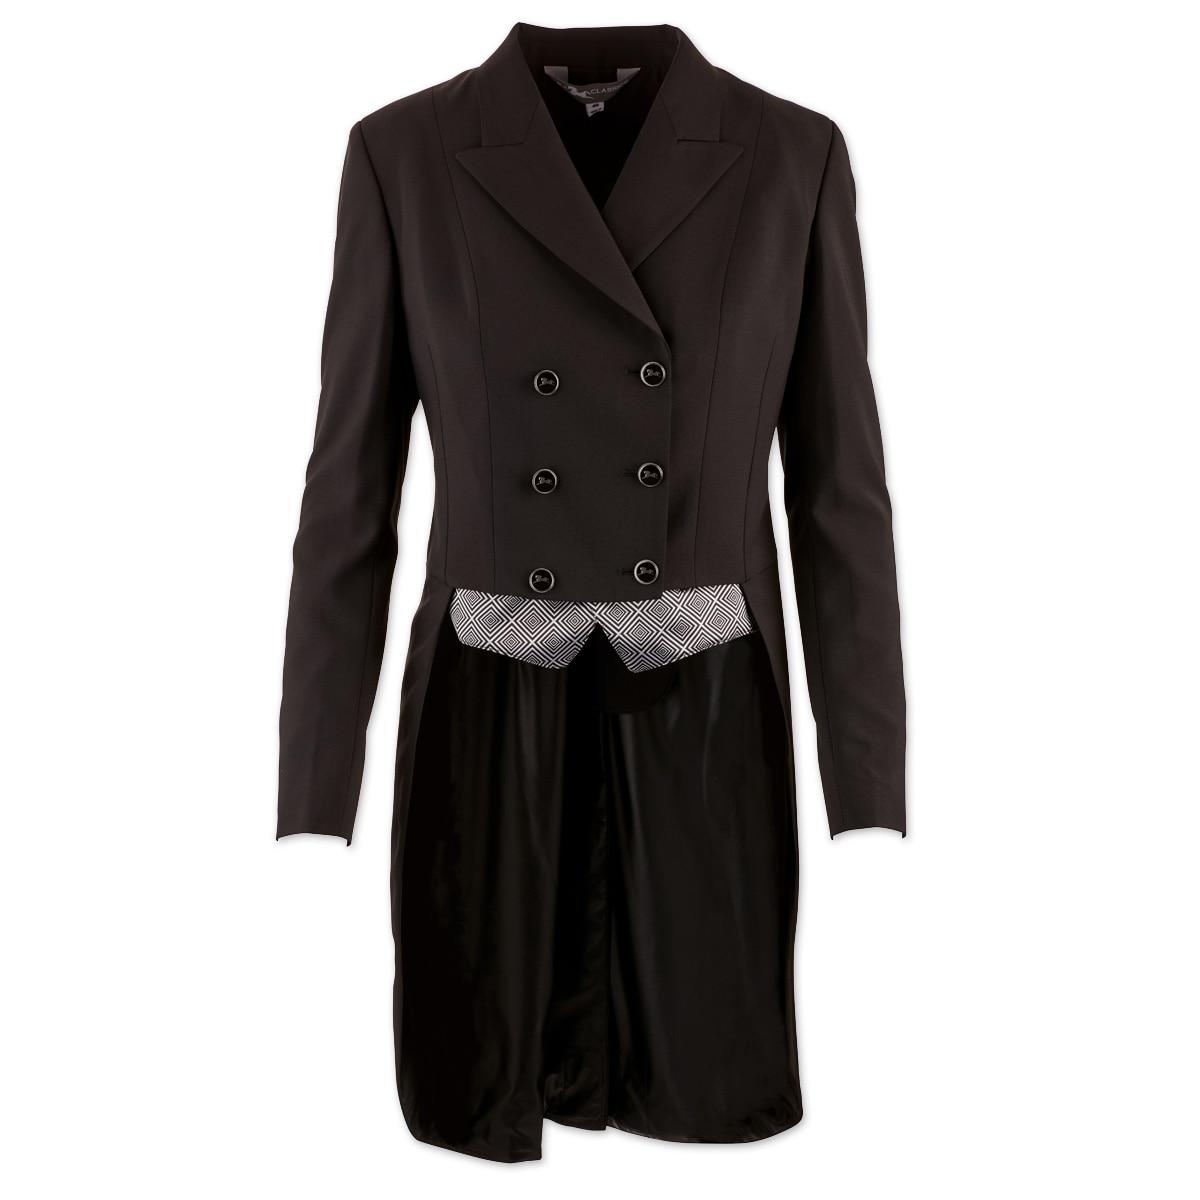 RJ Classics Renvers Grey Label Dressage Shadbelly